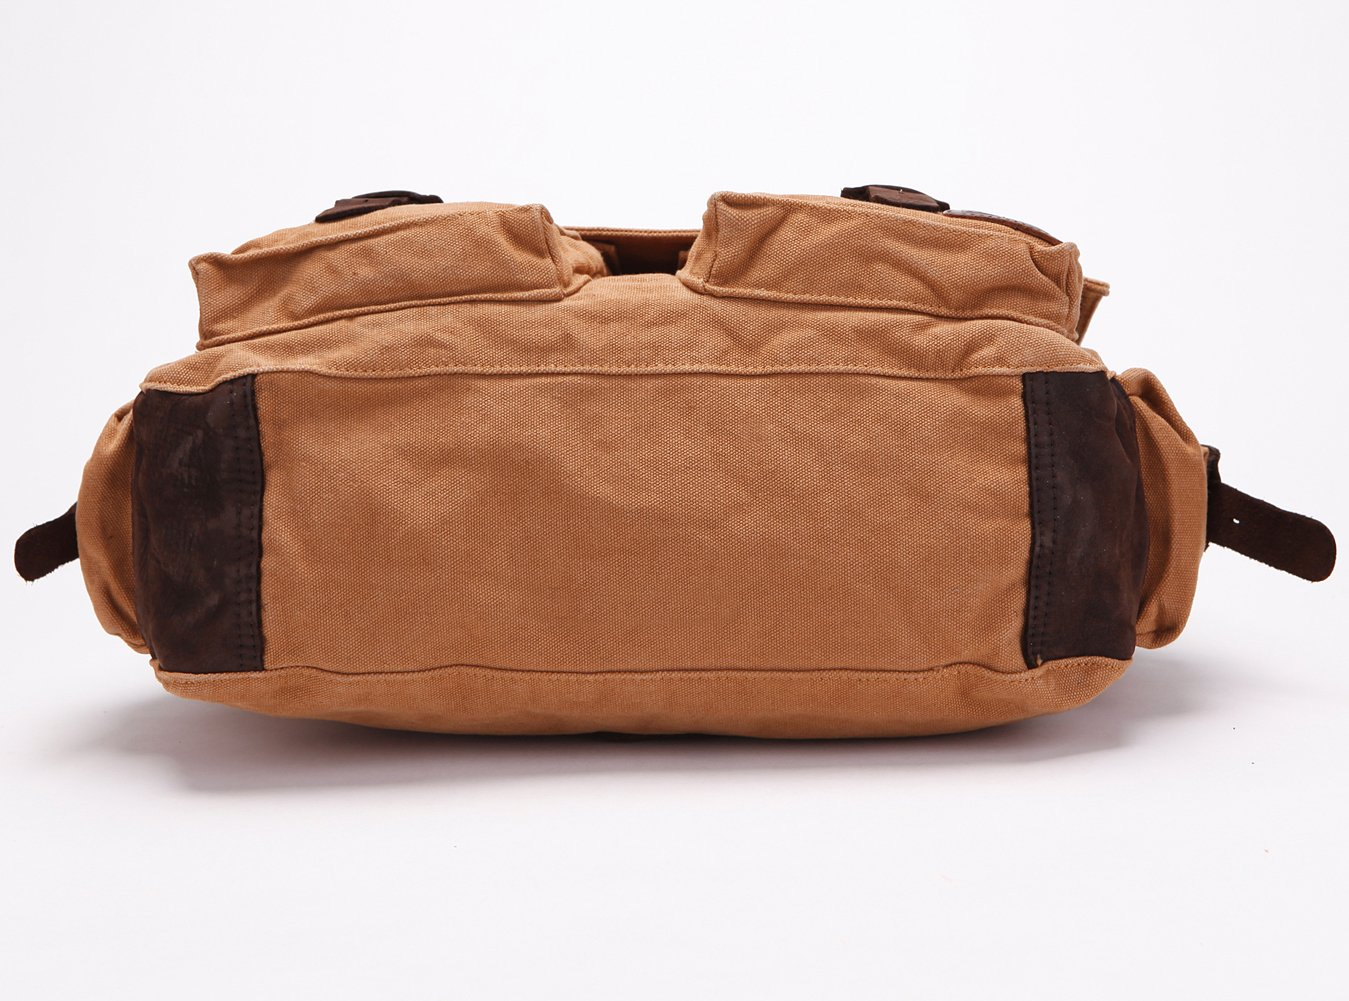 256fcdf47f ... Berchirly Vintage Military Men Canvas Messenger Bag 17.3Inch Laptop  SOLO MB0007AGXL ...